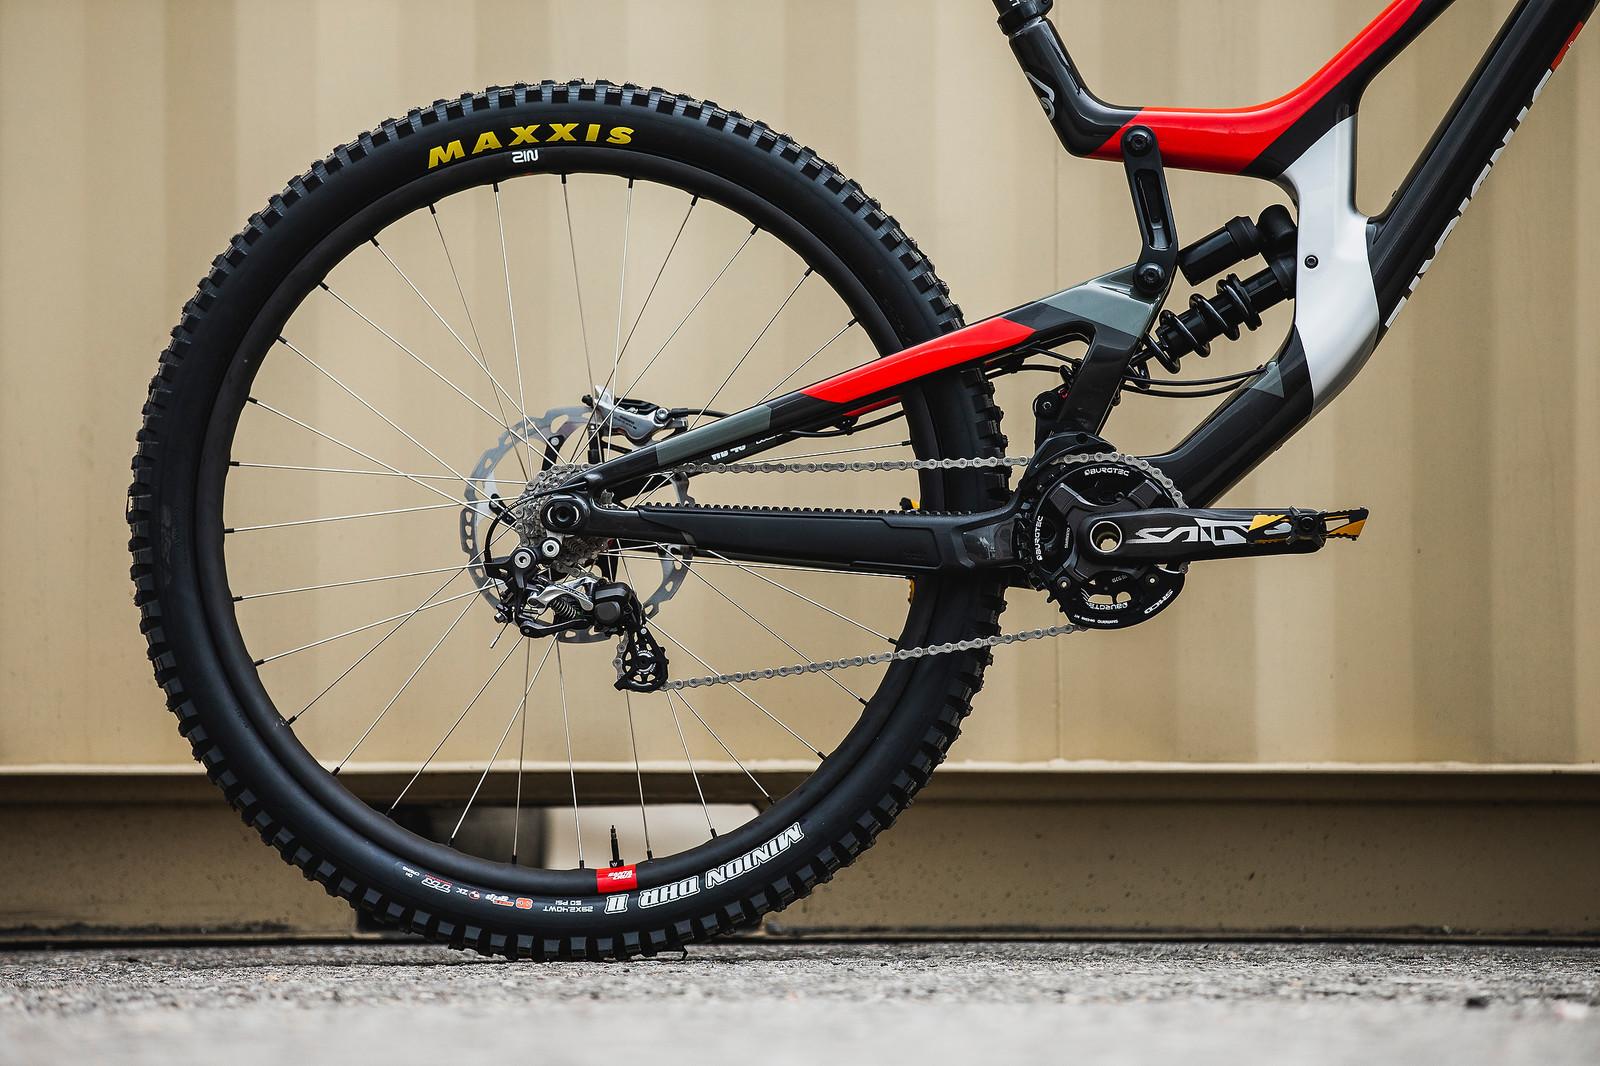 Loris' Santa Cruz V10 for Worlds - Santa Cruz Syndicate 2019 World Championships Race Bikes - Mountain Biking Pictures - Vital MTB